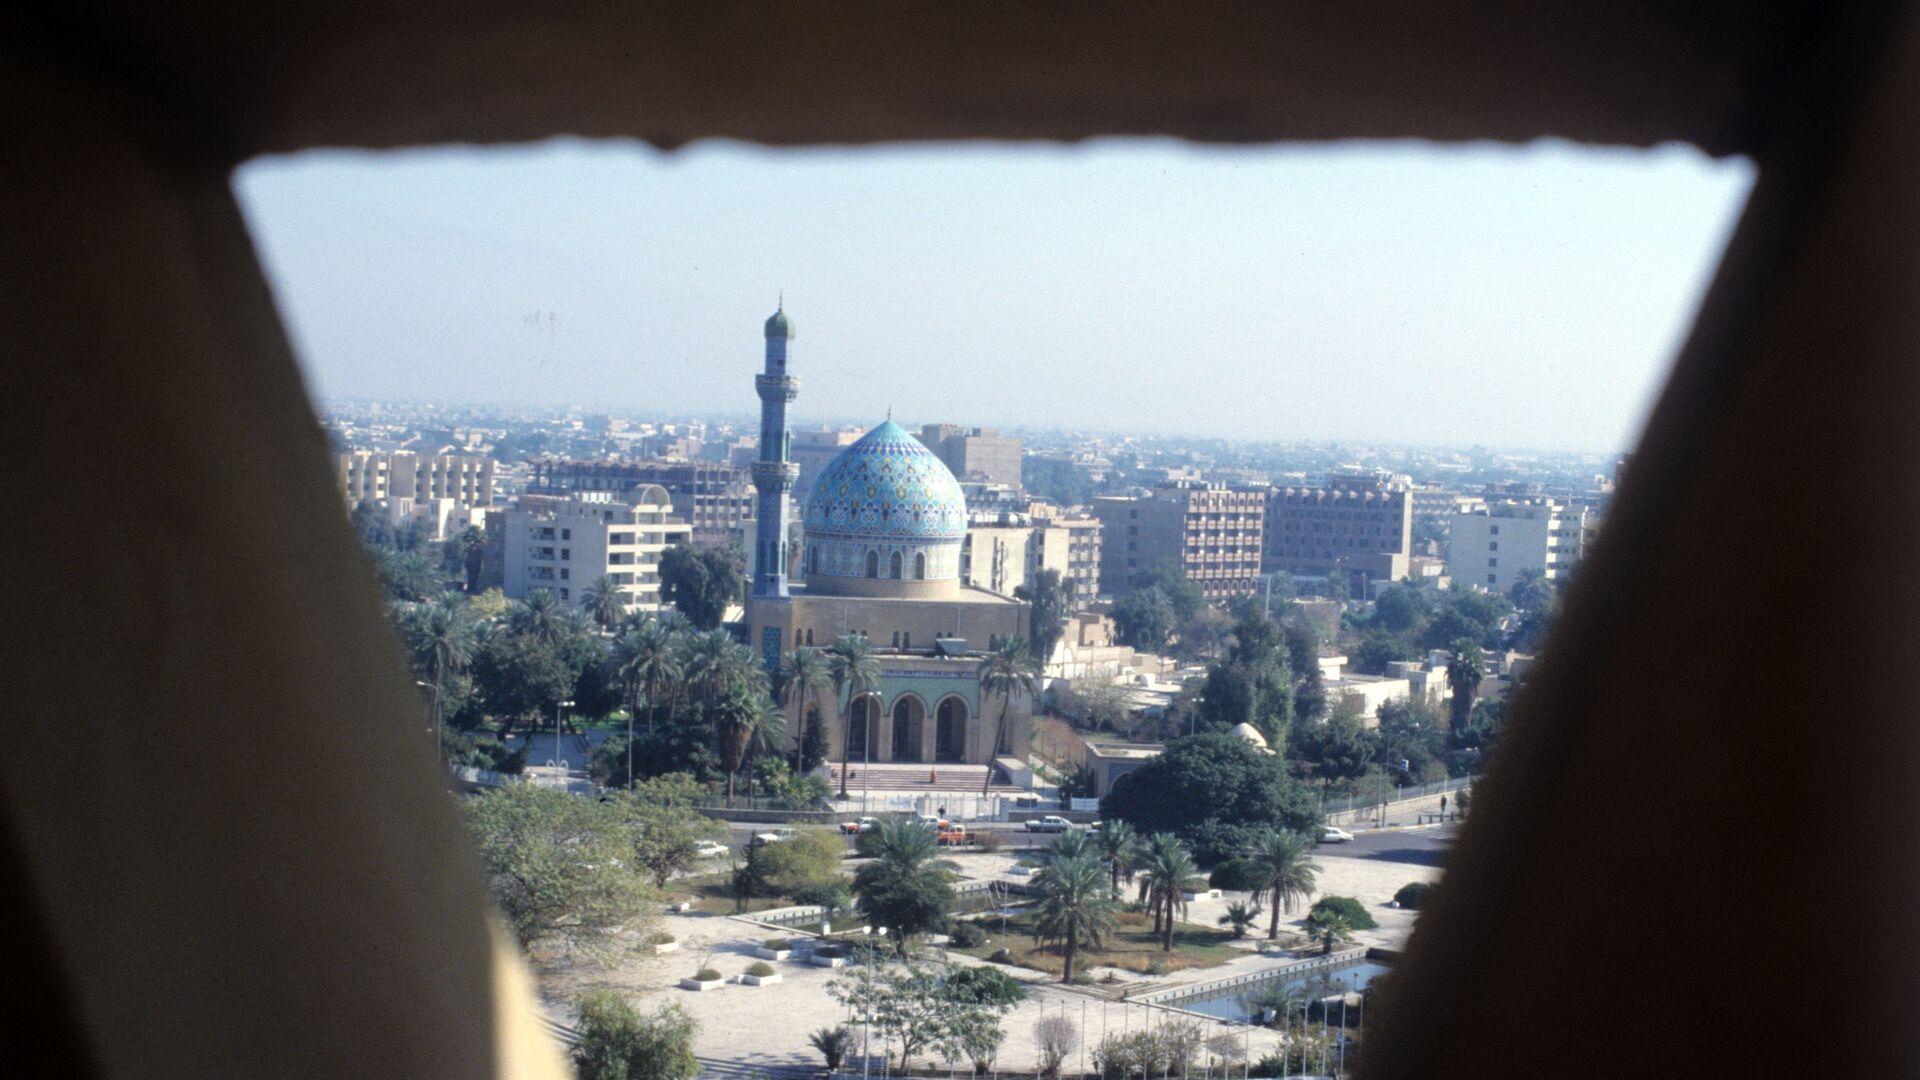 Bagdad, Irak - Sputnik France, 1920, 01.08.2021